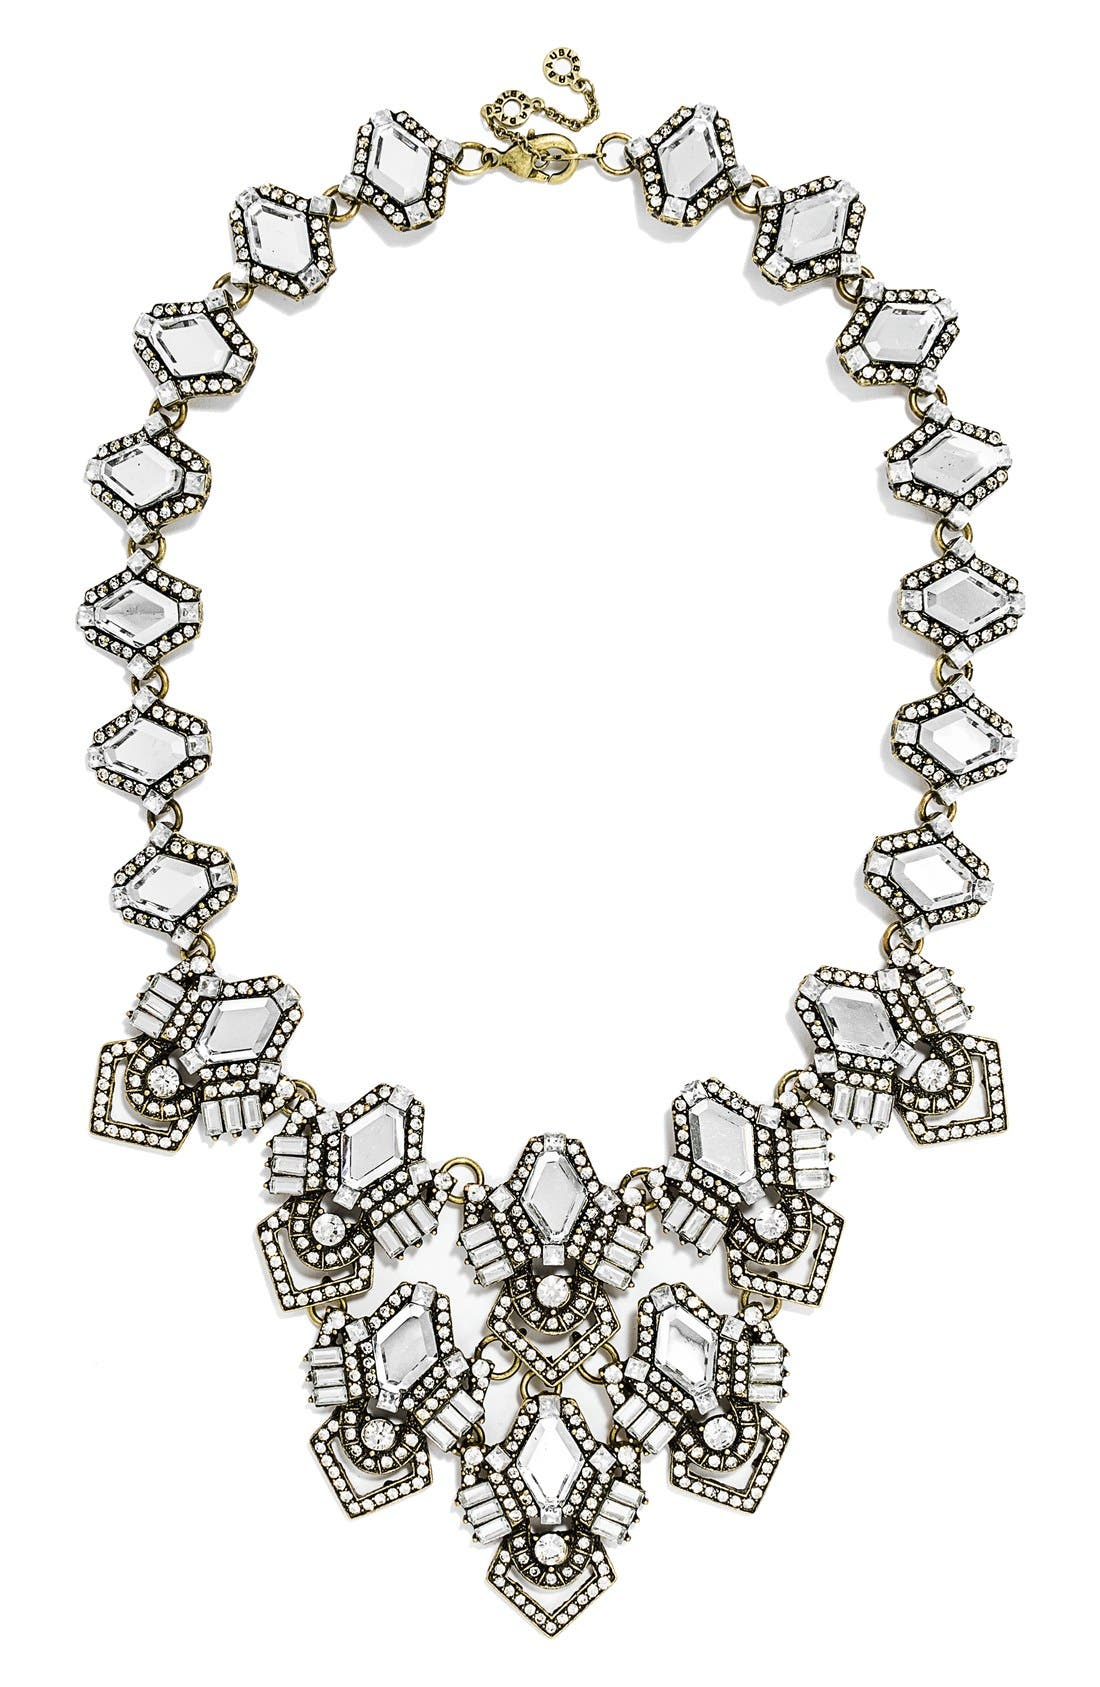 Main Image - BaubleBar 'Deco Diamond' Bib Necklace